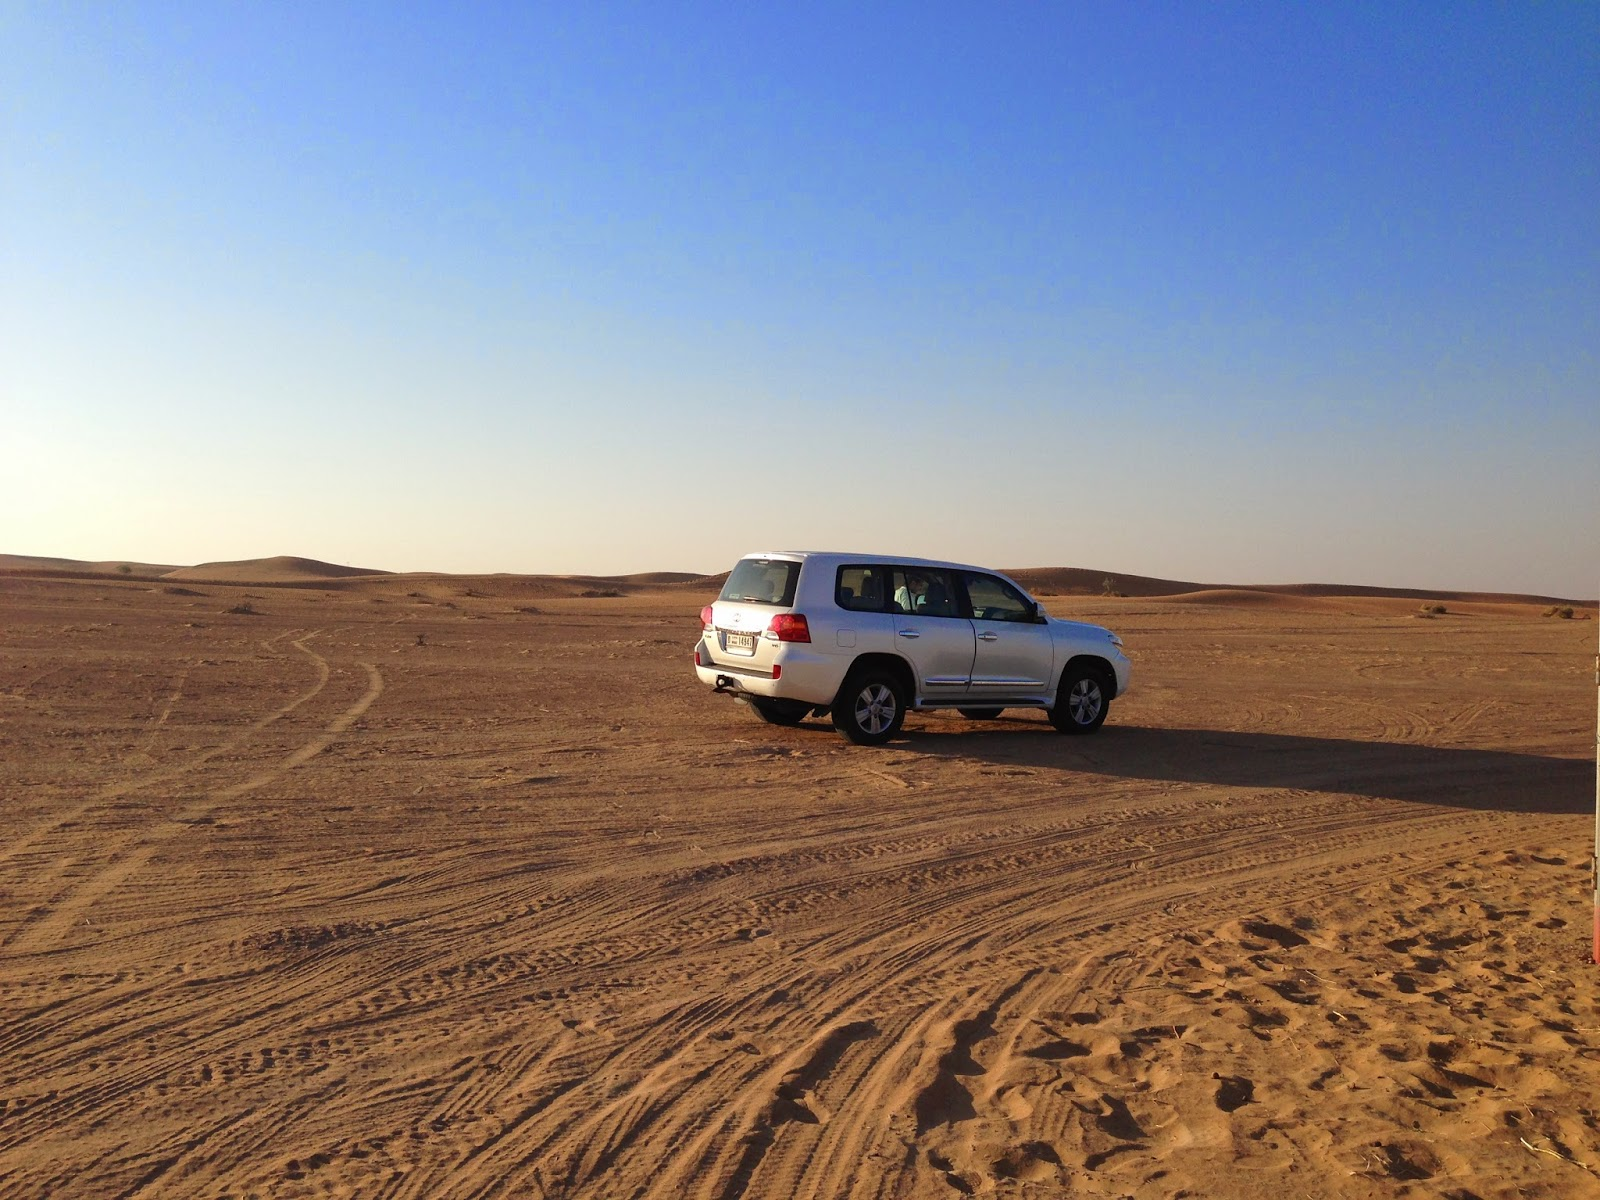 desert dune buggy adventure dubai